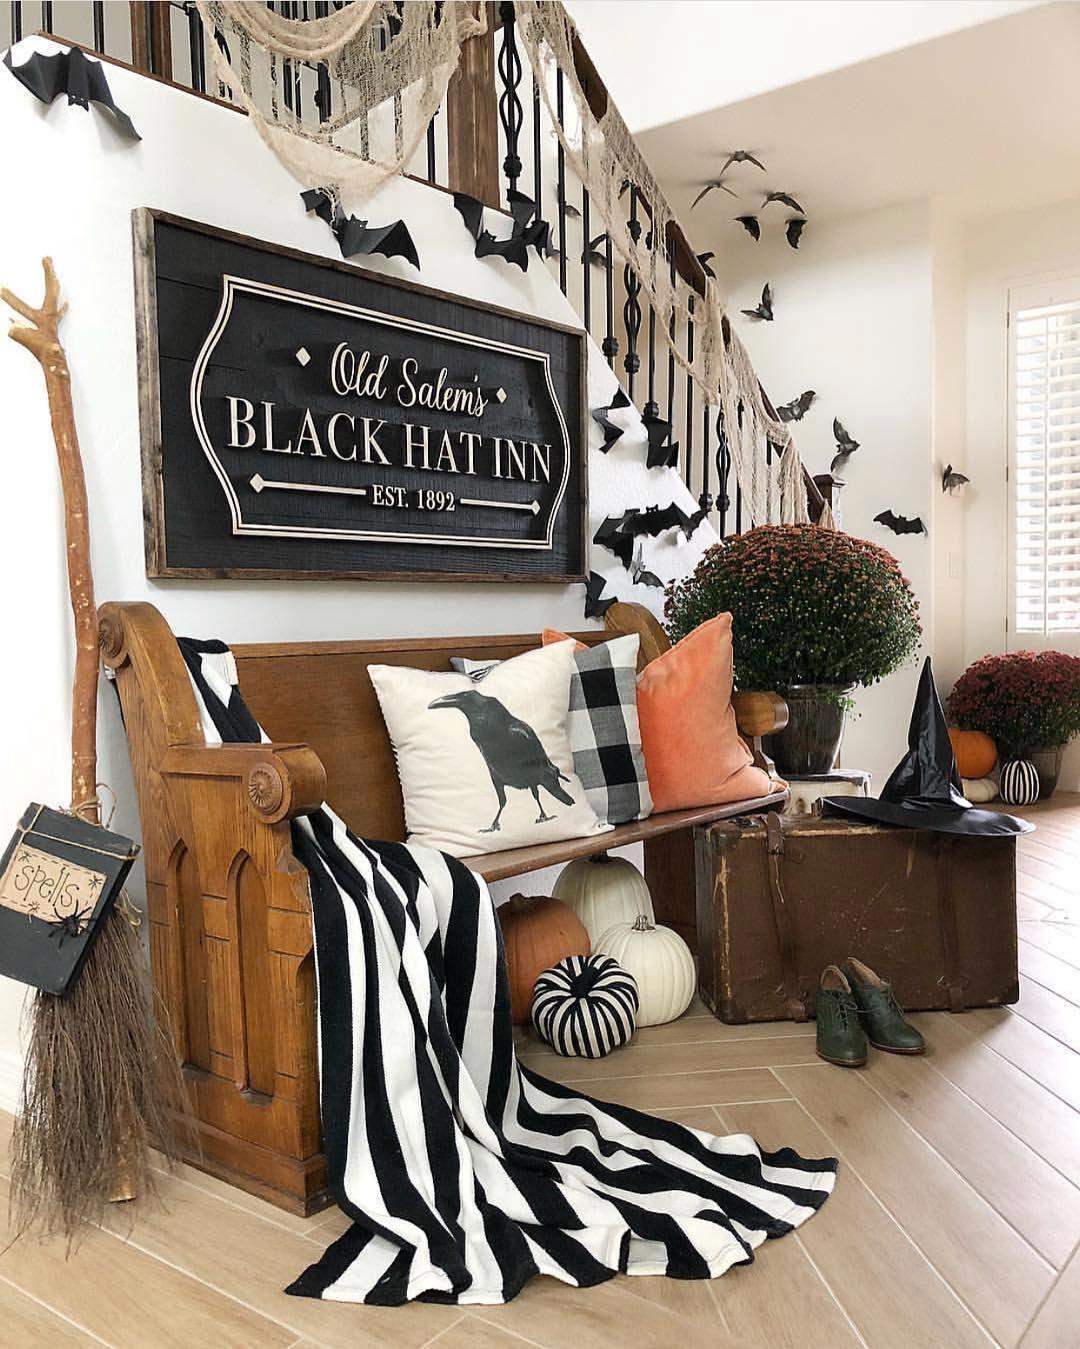 Do You Know How To Style Your Home For Halloween Season? #falldecorideas